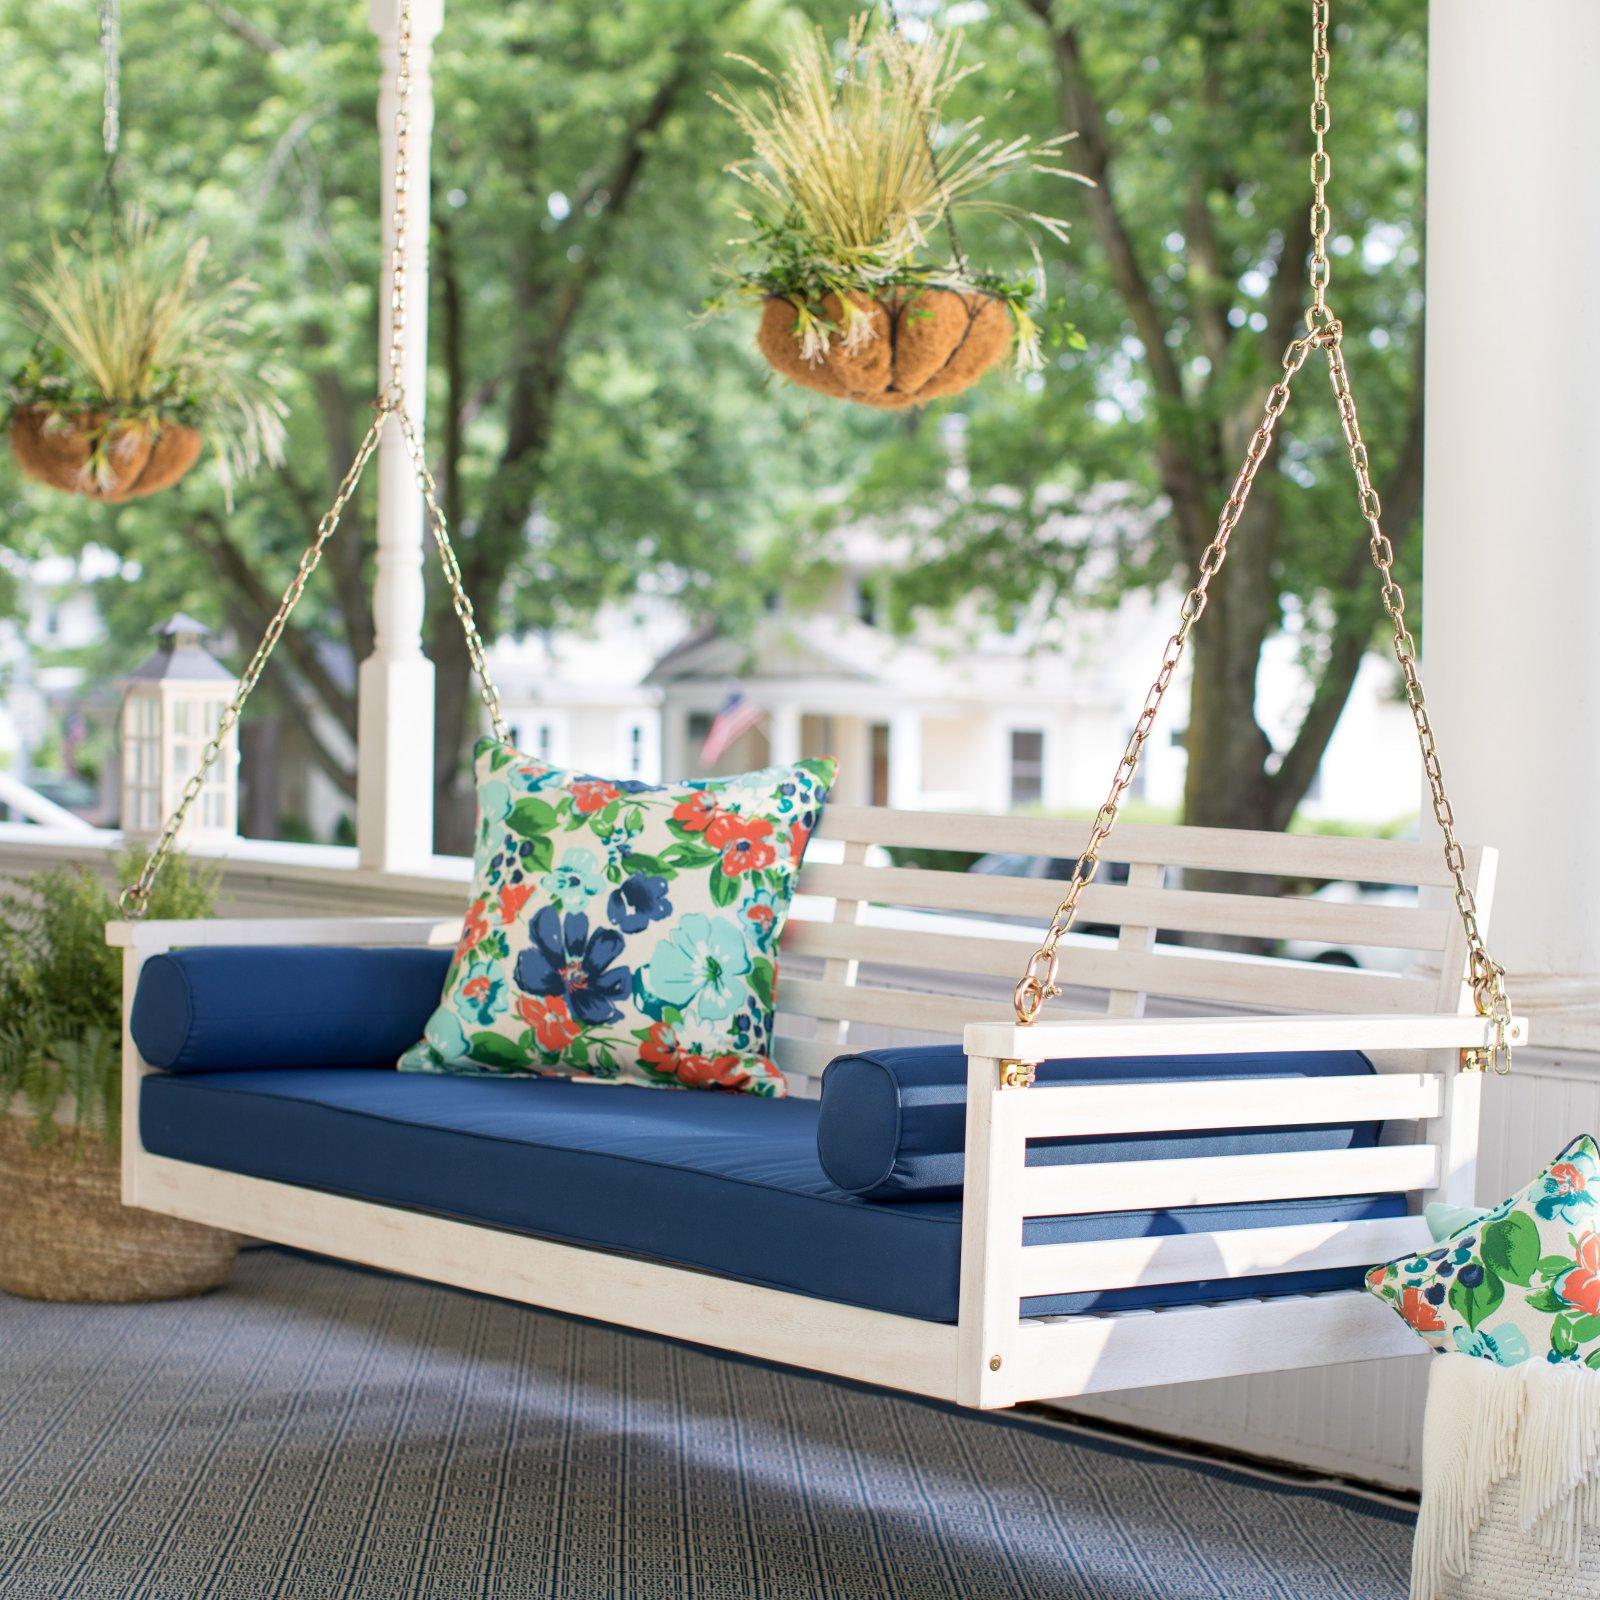 Belham Living Brighton Beach Deep Seating Porch Swing Bed with Cushion